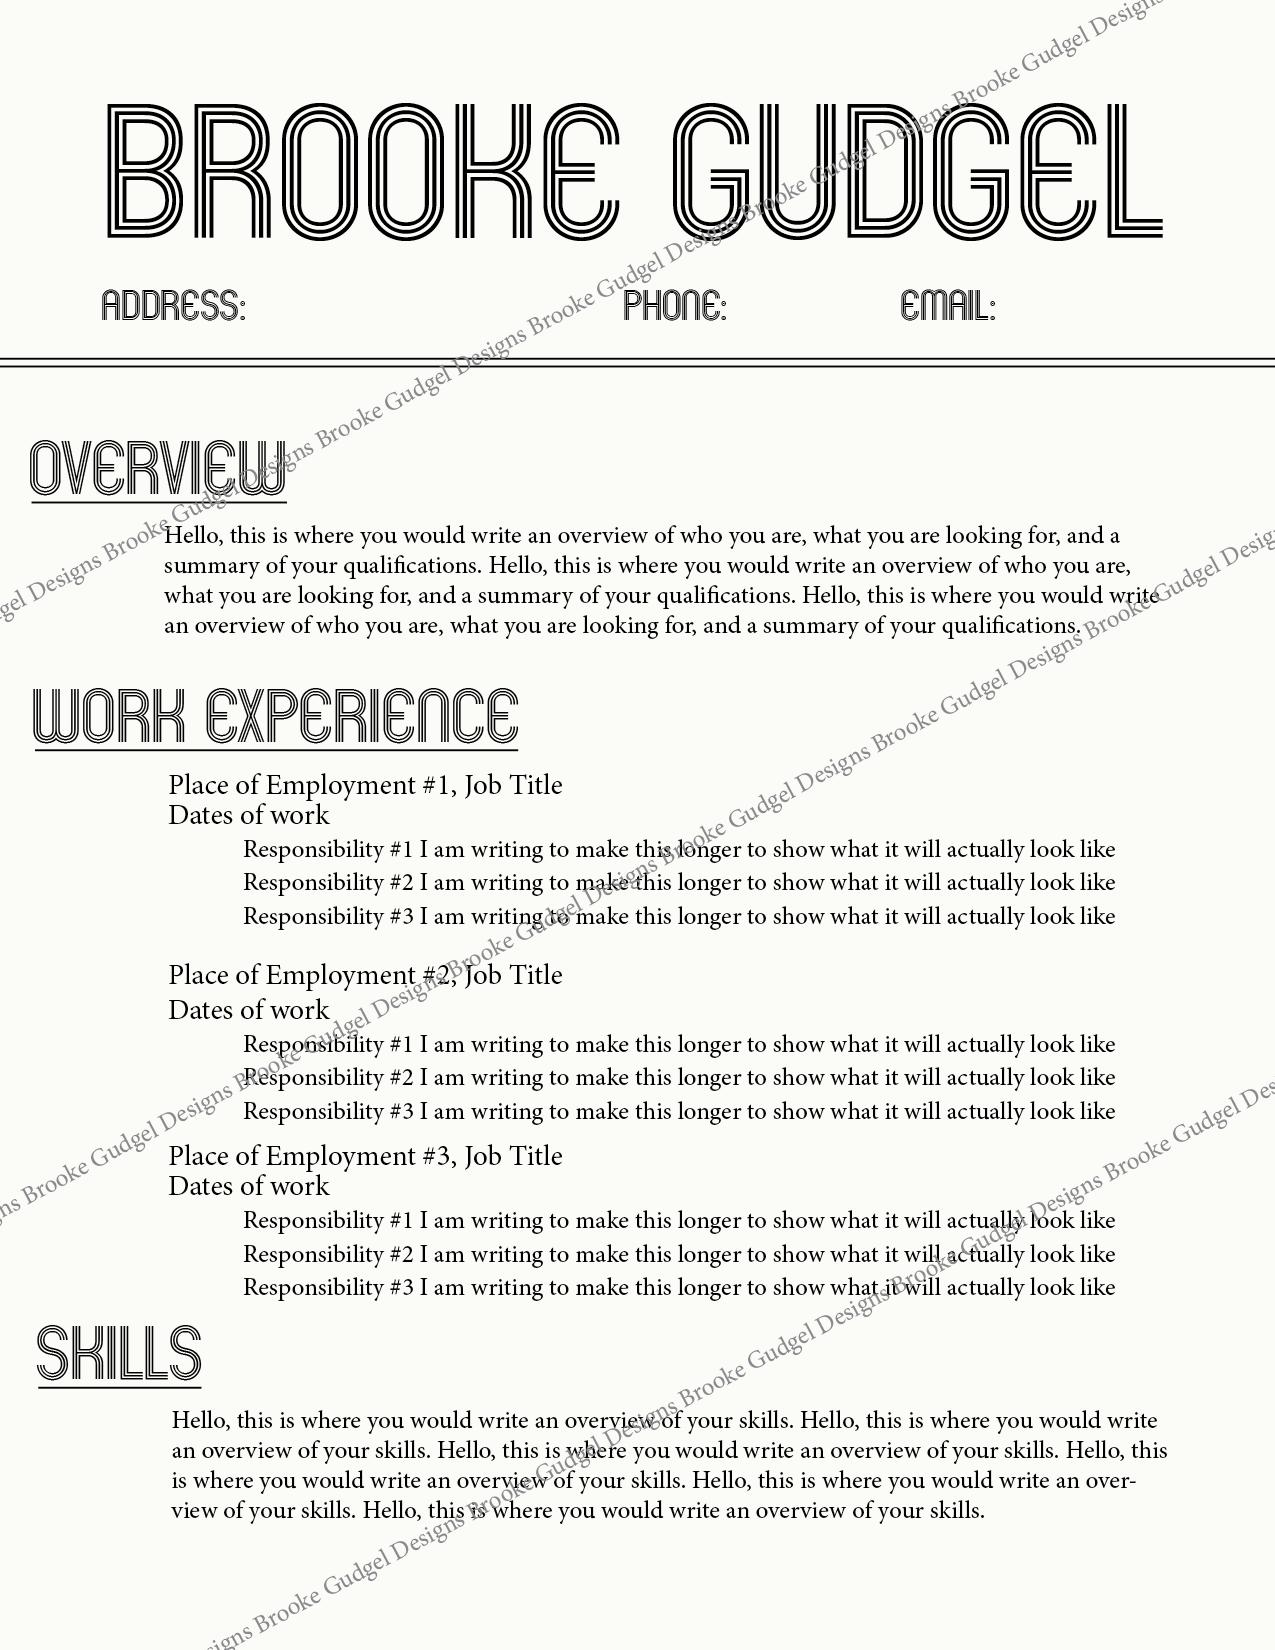 Retro Resume Contact Brookegudgel Gmail Com Rush Sorority Resume Template Sorority Resume Resume Template Resume Examples